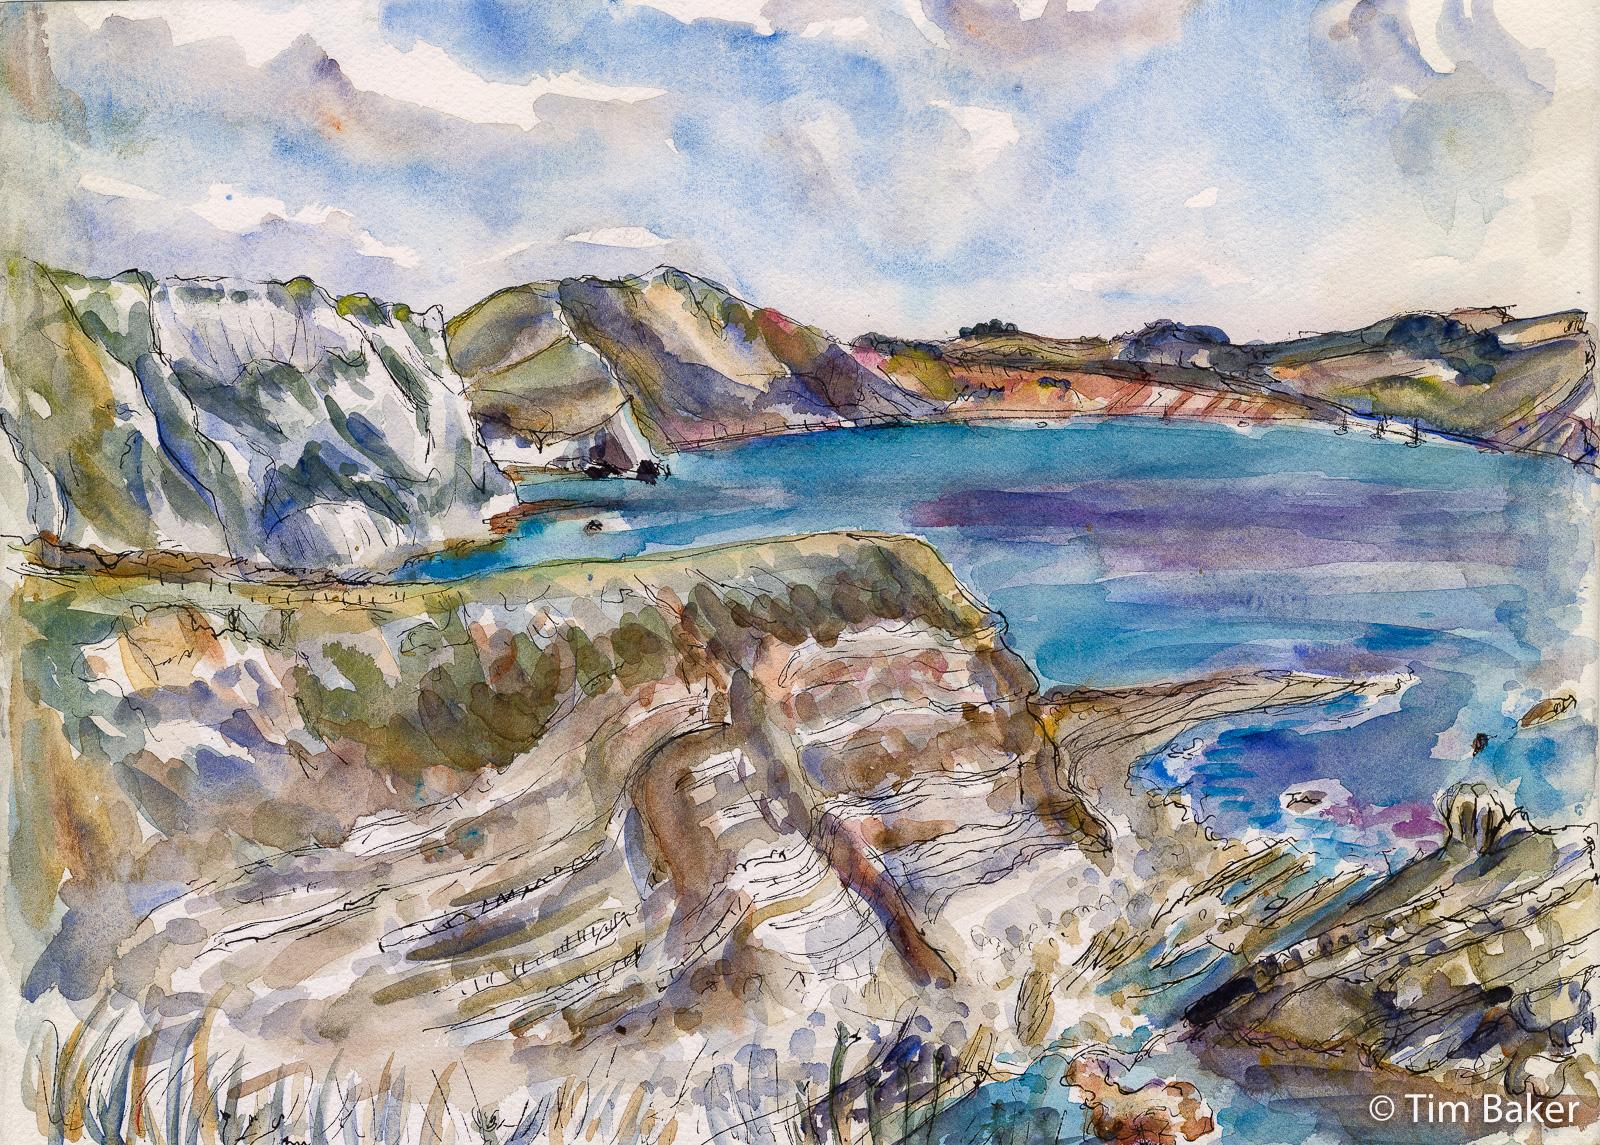 2021-Jurassic-Coast-Weymouth-to-Swanage-Mupe-Bay-Watercolour-1-Pano.jpg